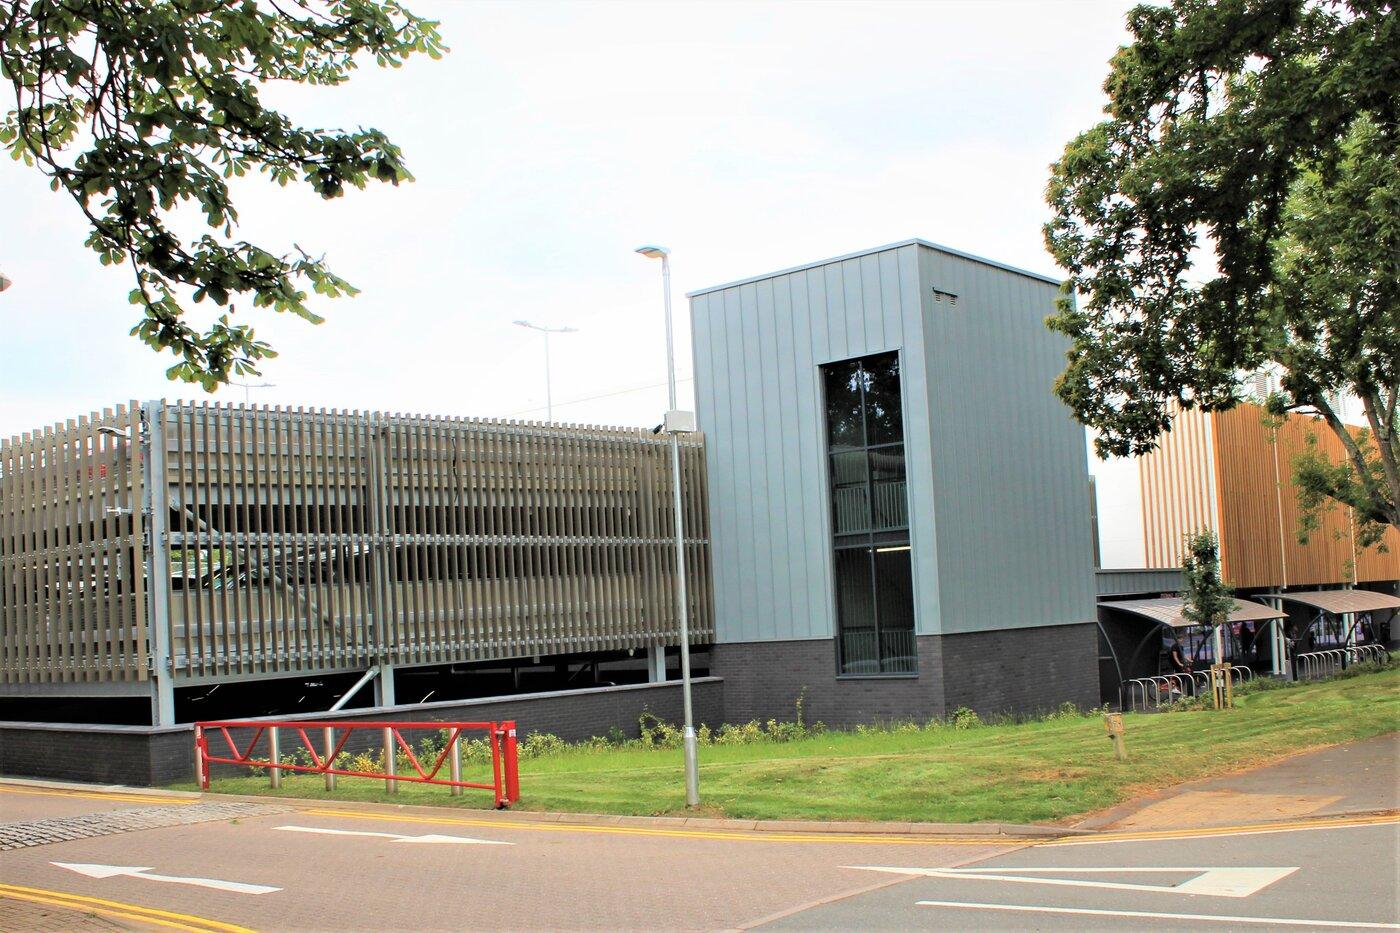 Places Leisure Centre multi storey car park designed and build by Bourne Parking